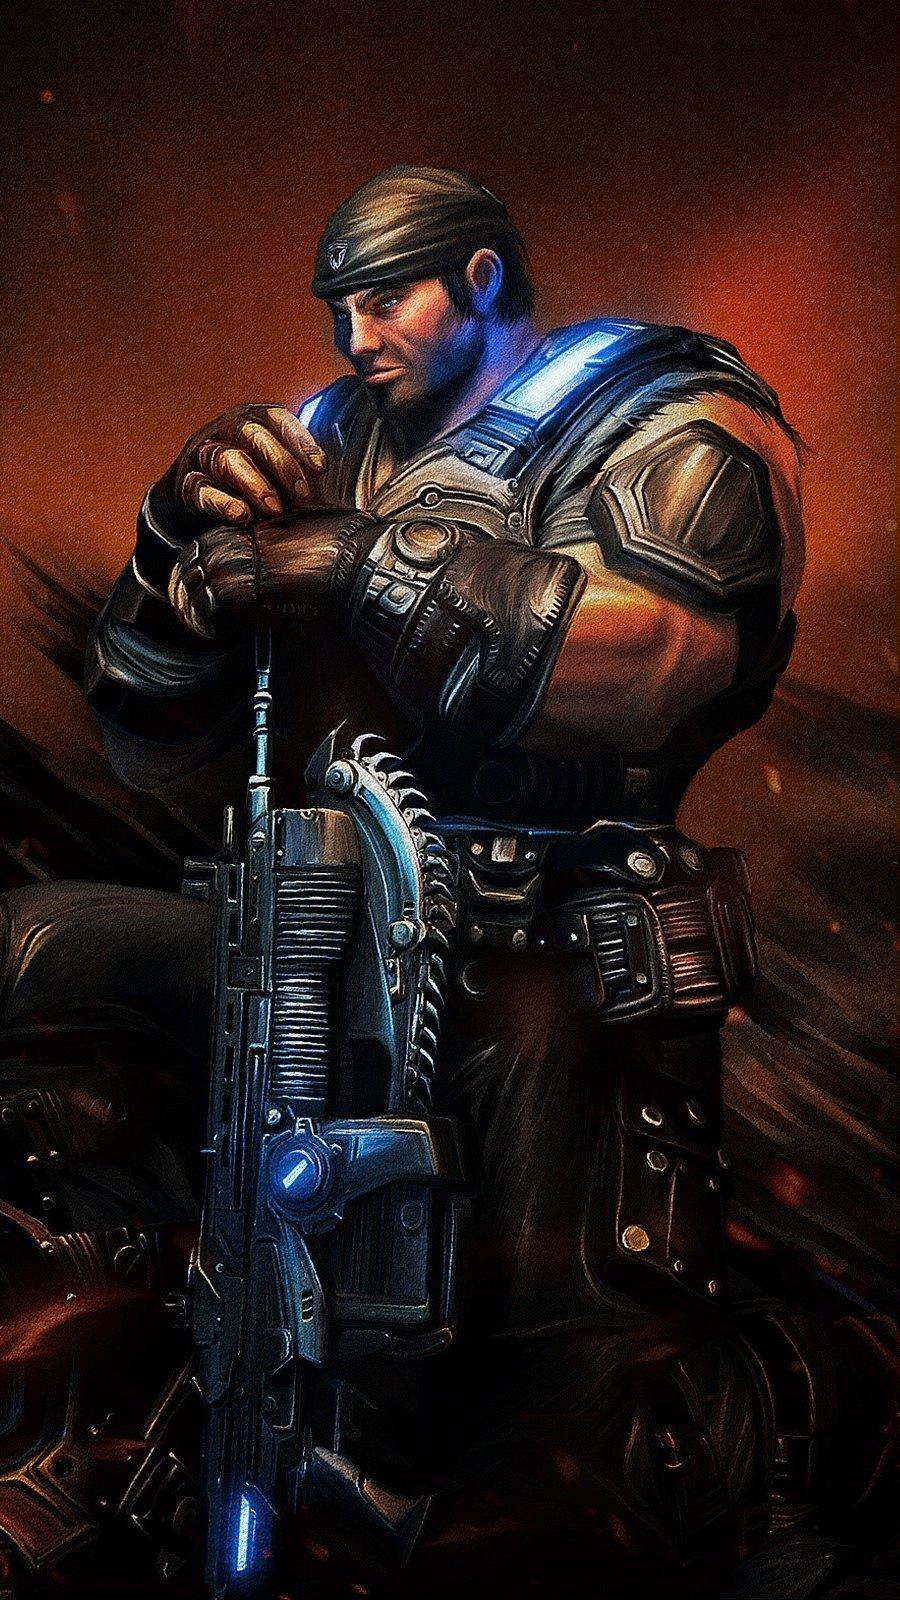 Wallpaper Sergeant Marcus Michael Fenix Gears Of War Vertical